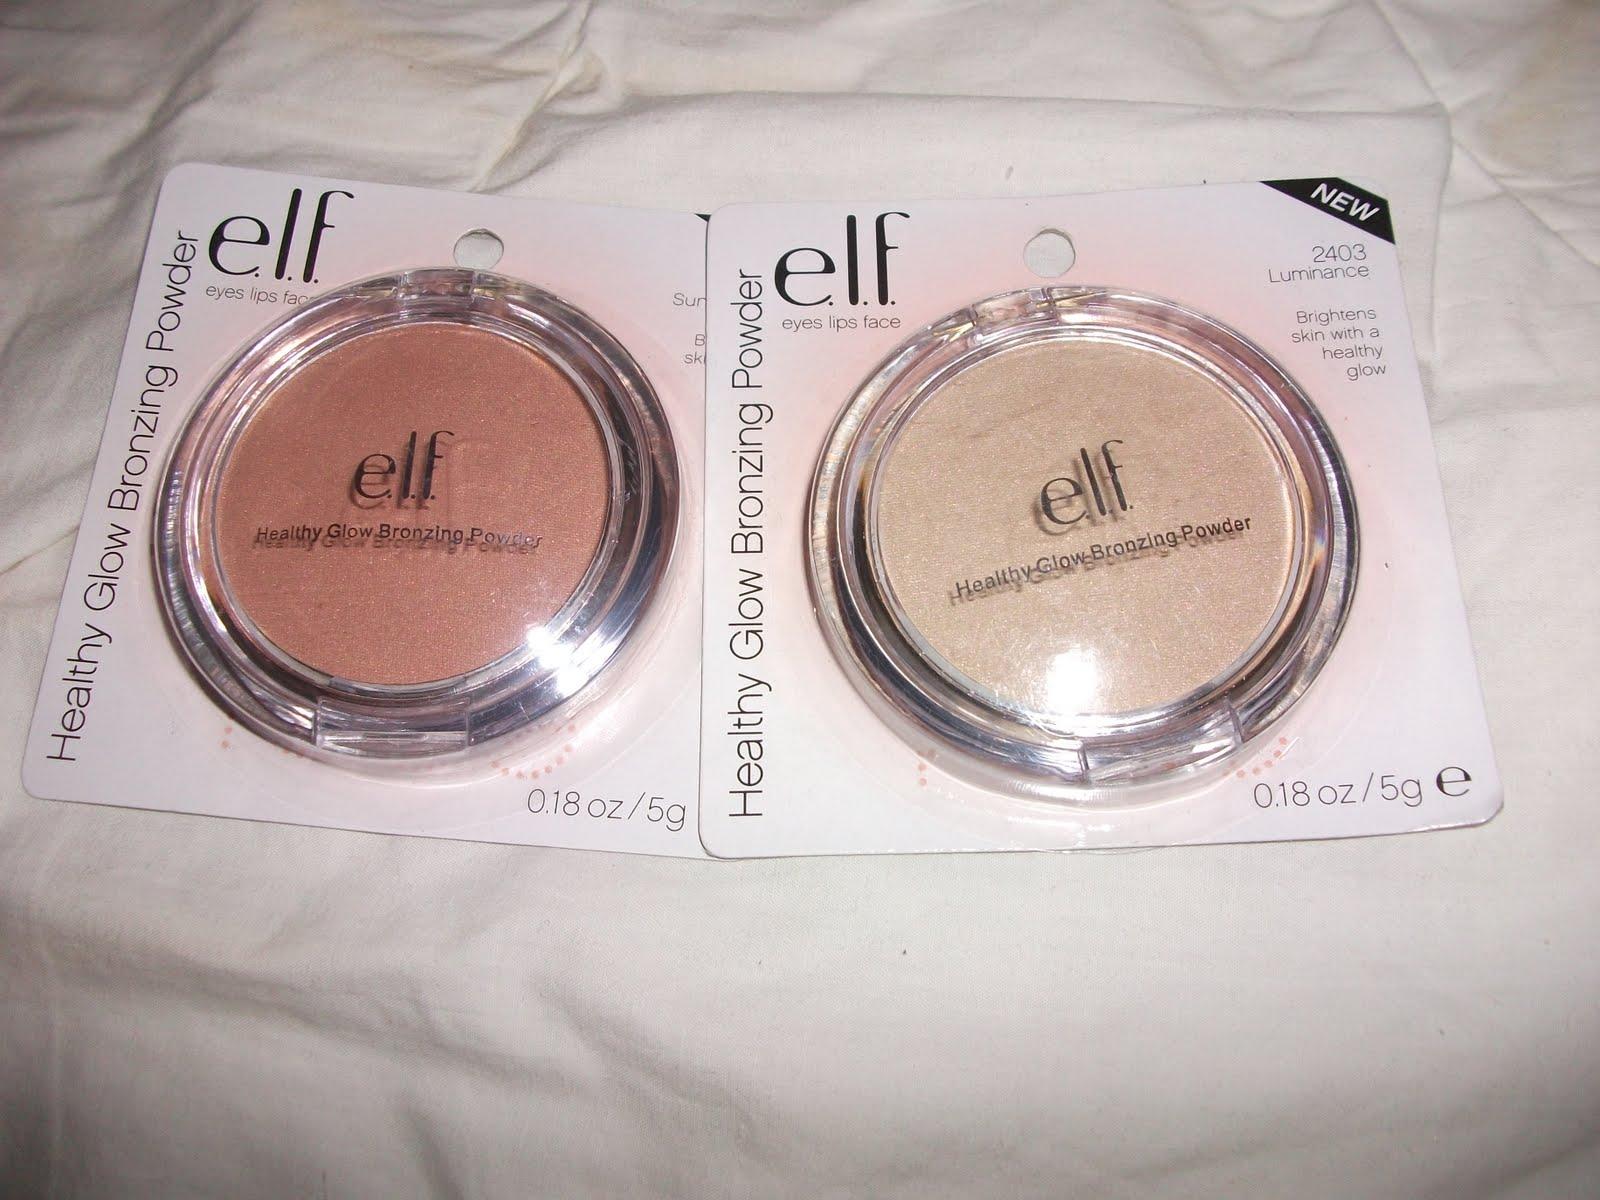 e.l.f. Cosmetics Healthy Glow Bronzing Powder -- Sunkissed ...